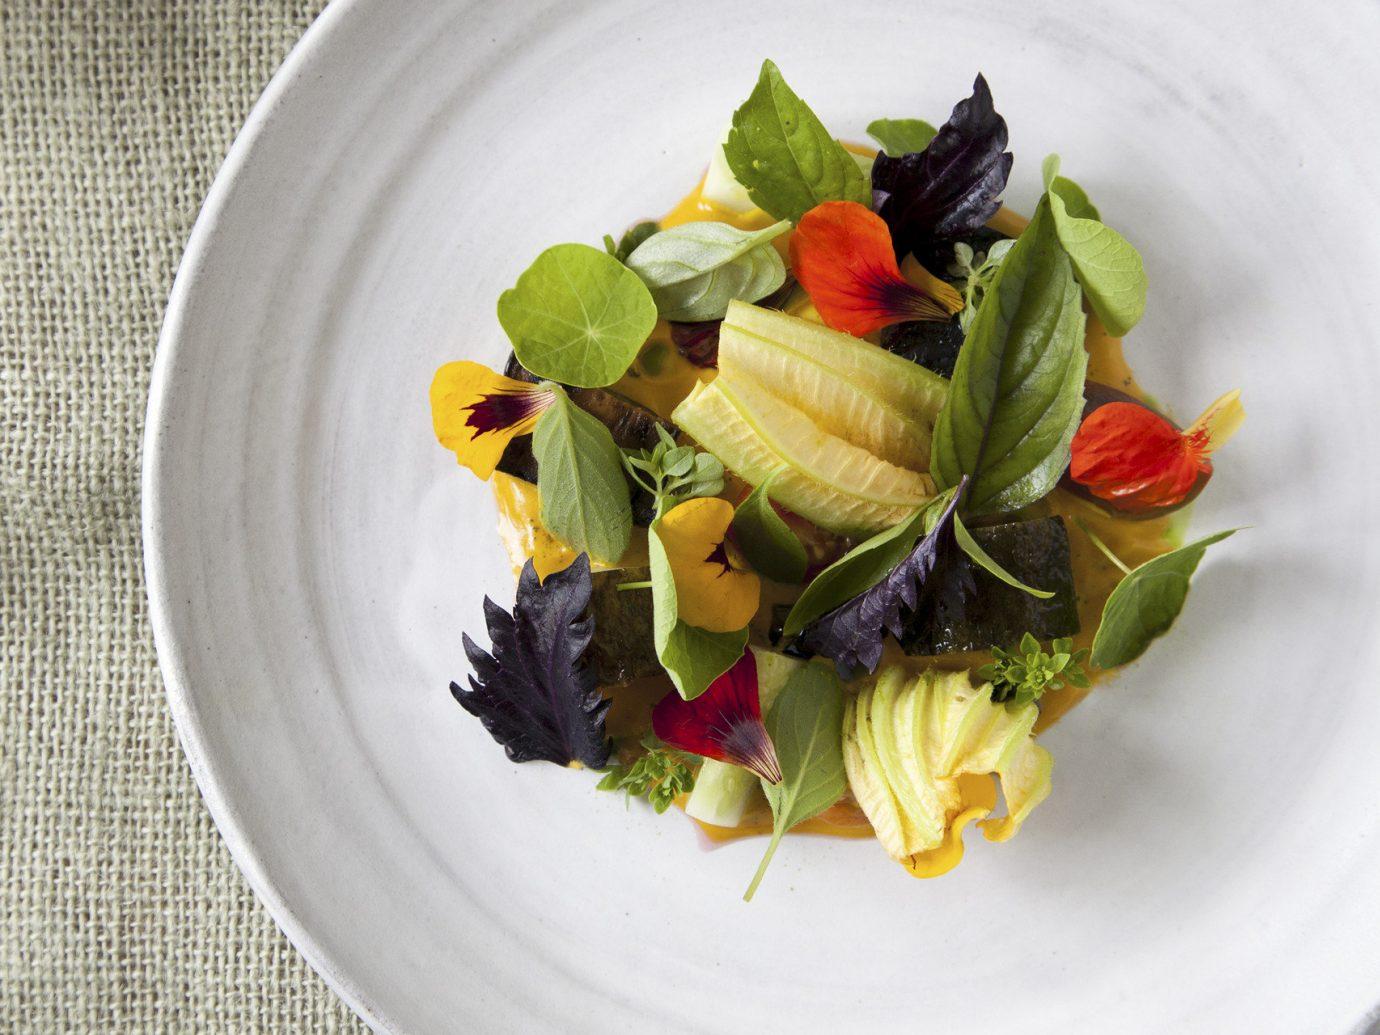 fancy fine dining food Food + Drink gourmet Luxury sophisticated plate dish produce salad plant vegetable land plant cuisine fruit flowering plant herb arranged sliced